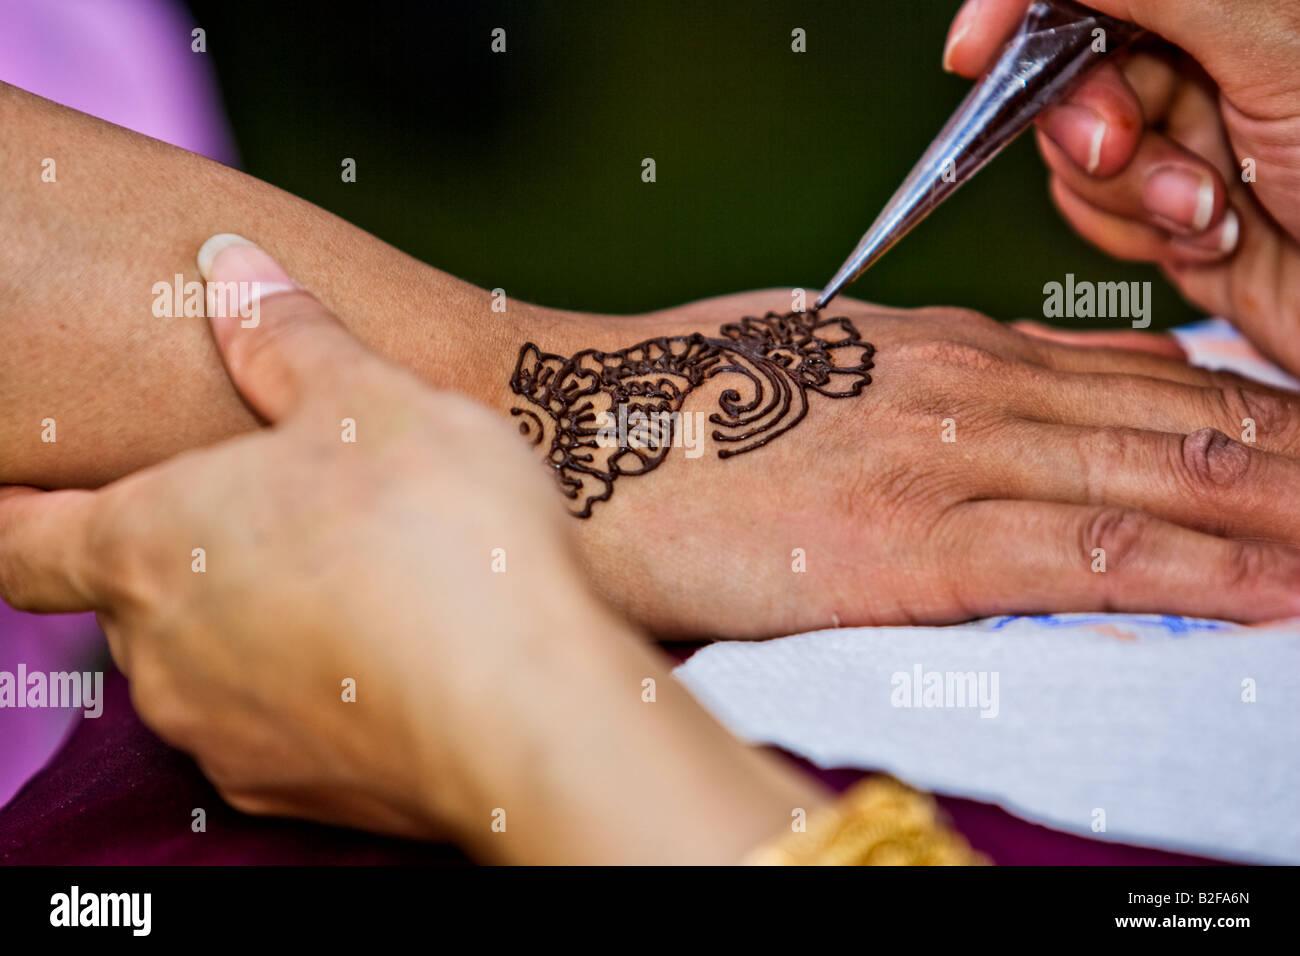 Bridal Mehndi Birmingham : Close up of hand having mehndi decoration applied at the birmingham